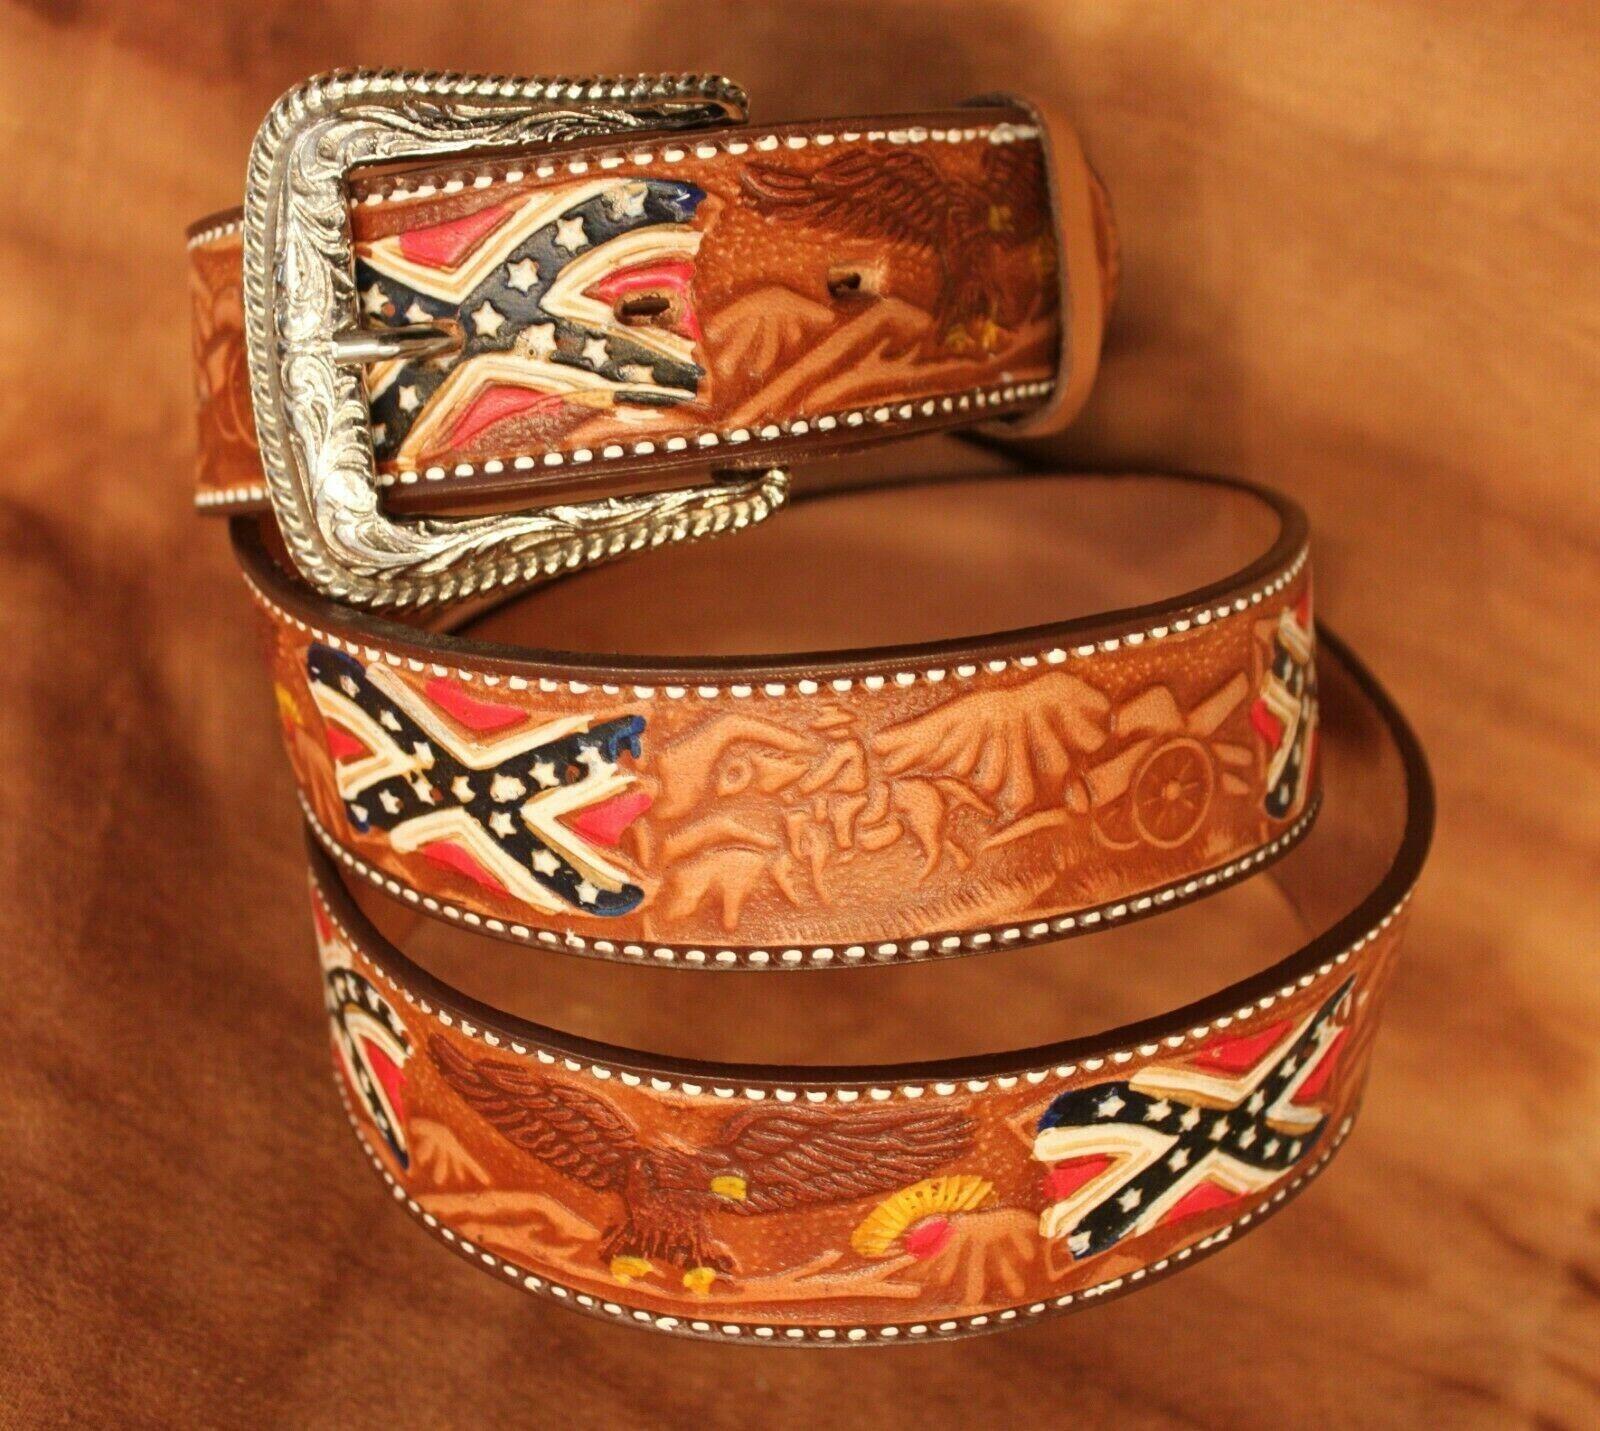 AC Belt V. Stars and Stripes, WG 12, Brown, Leather,! lagerräumug!